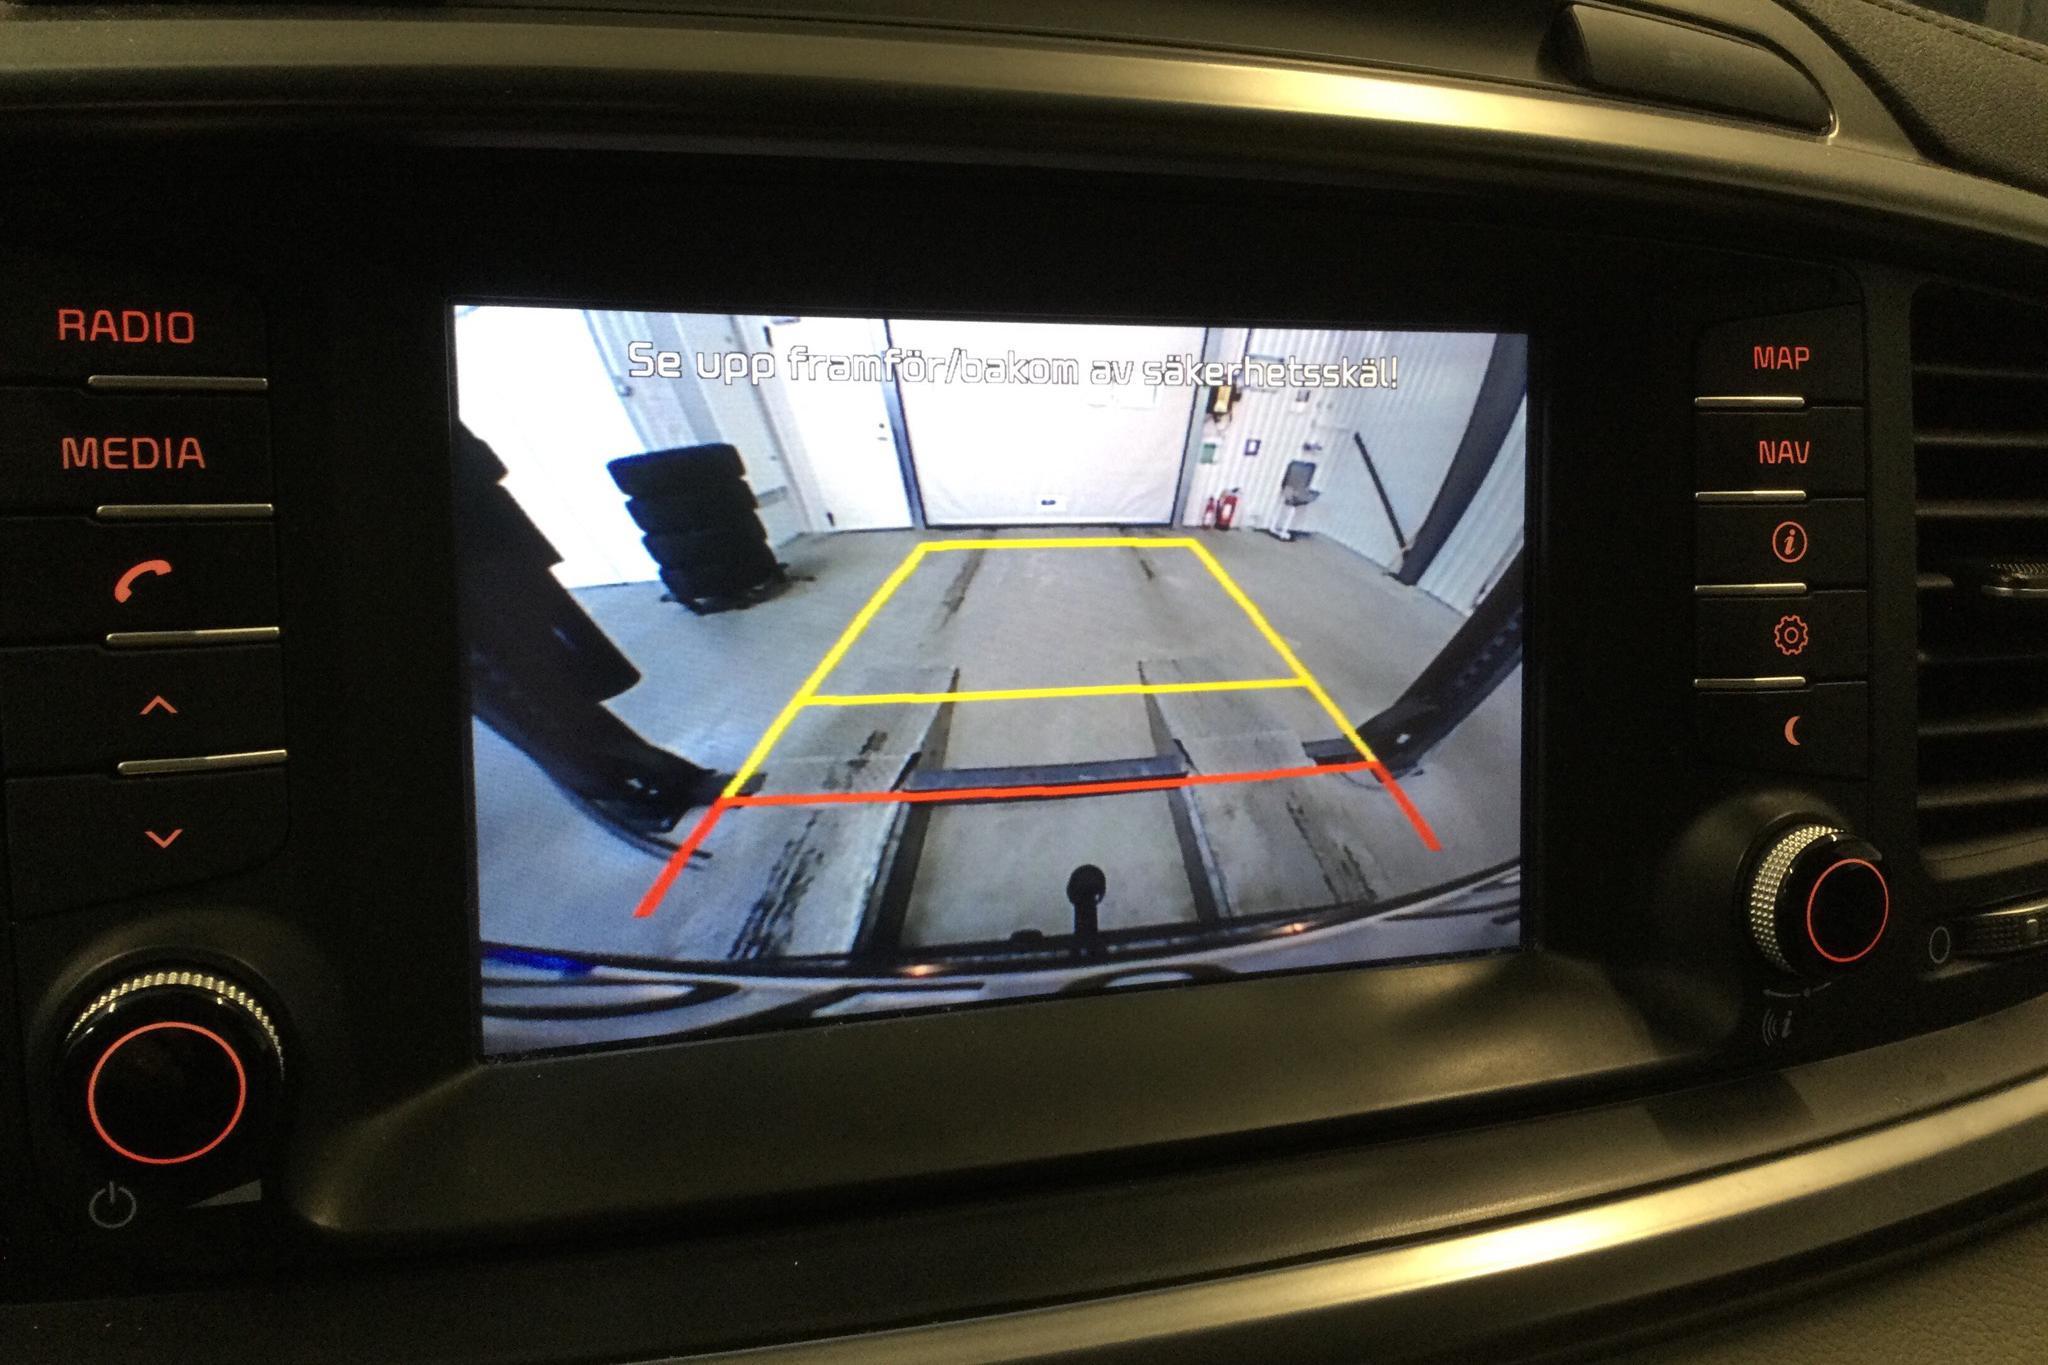 KIA Sorento 2.2 CRDi (200hk) - 11 759 mil - Automat - grå - 2016